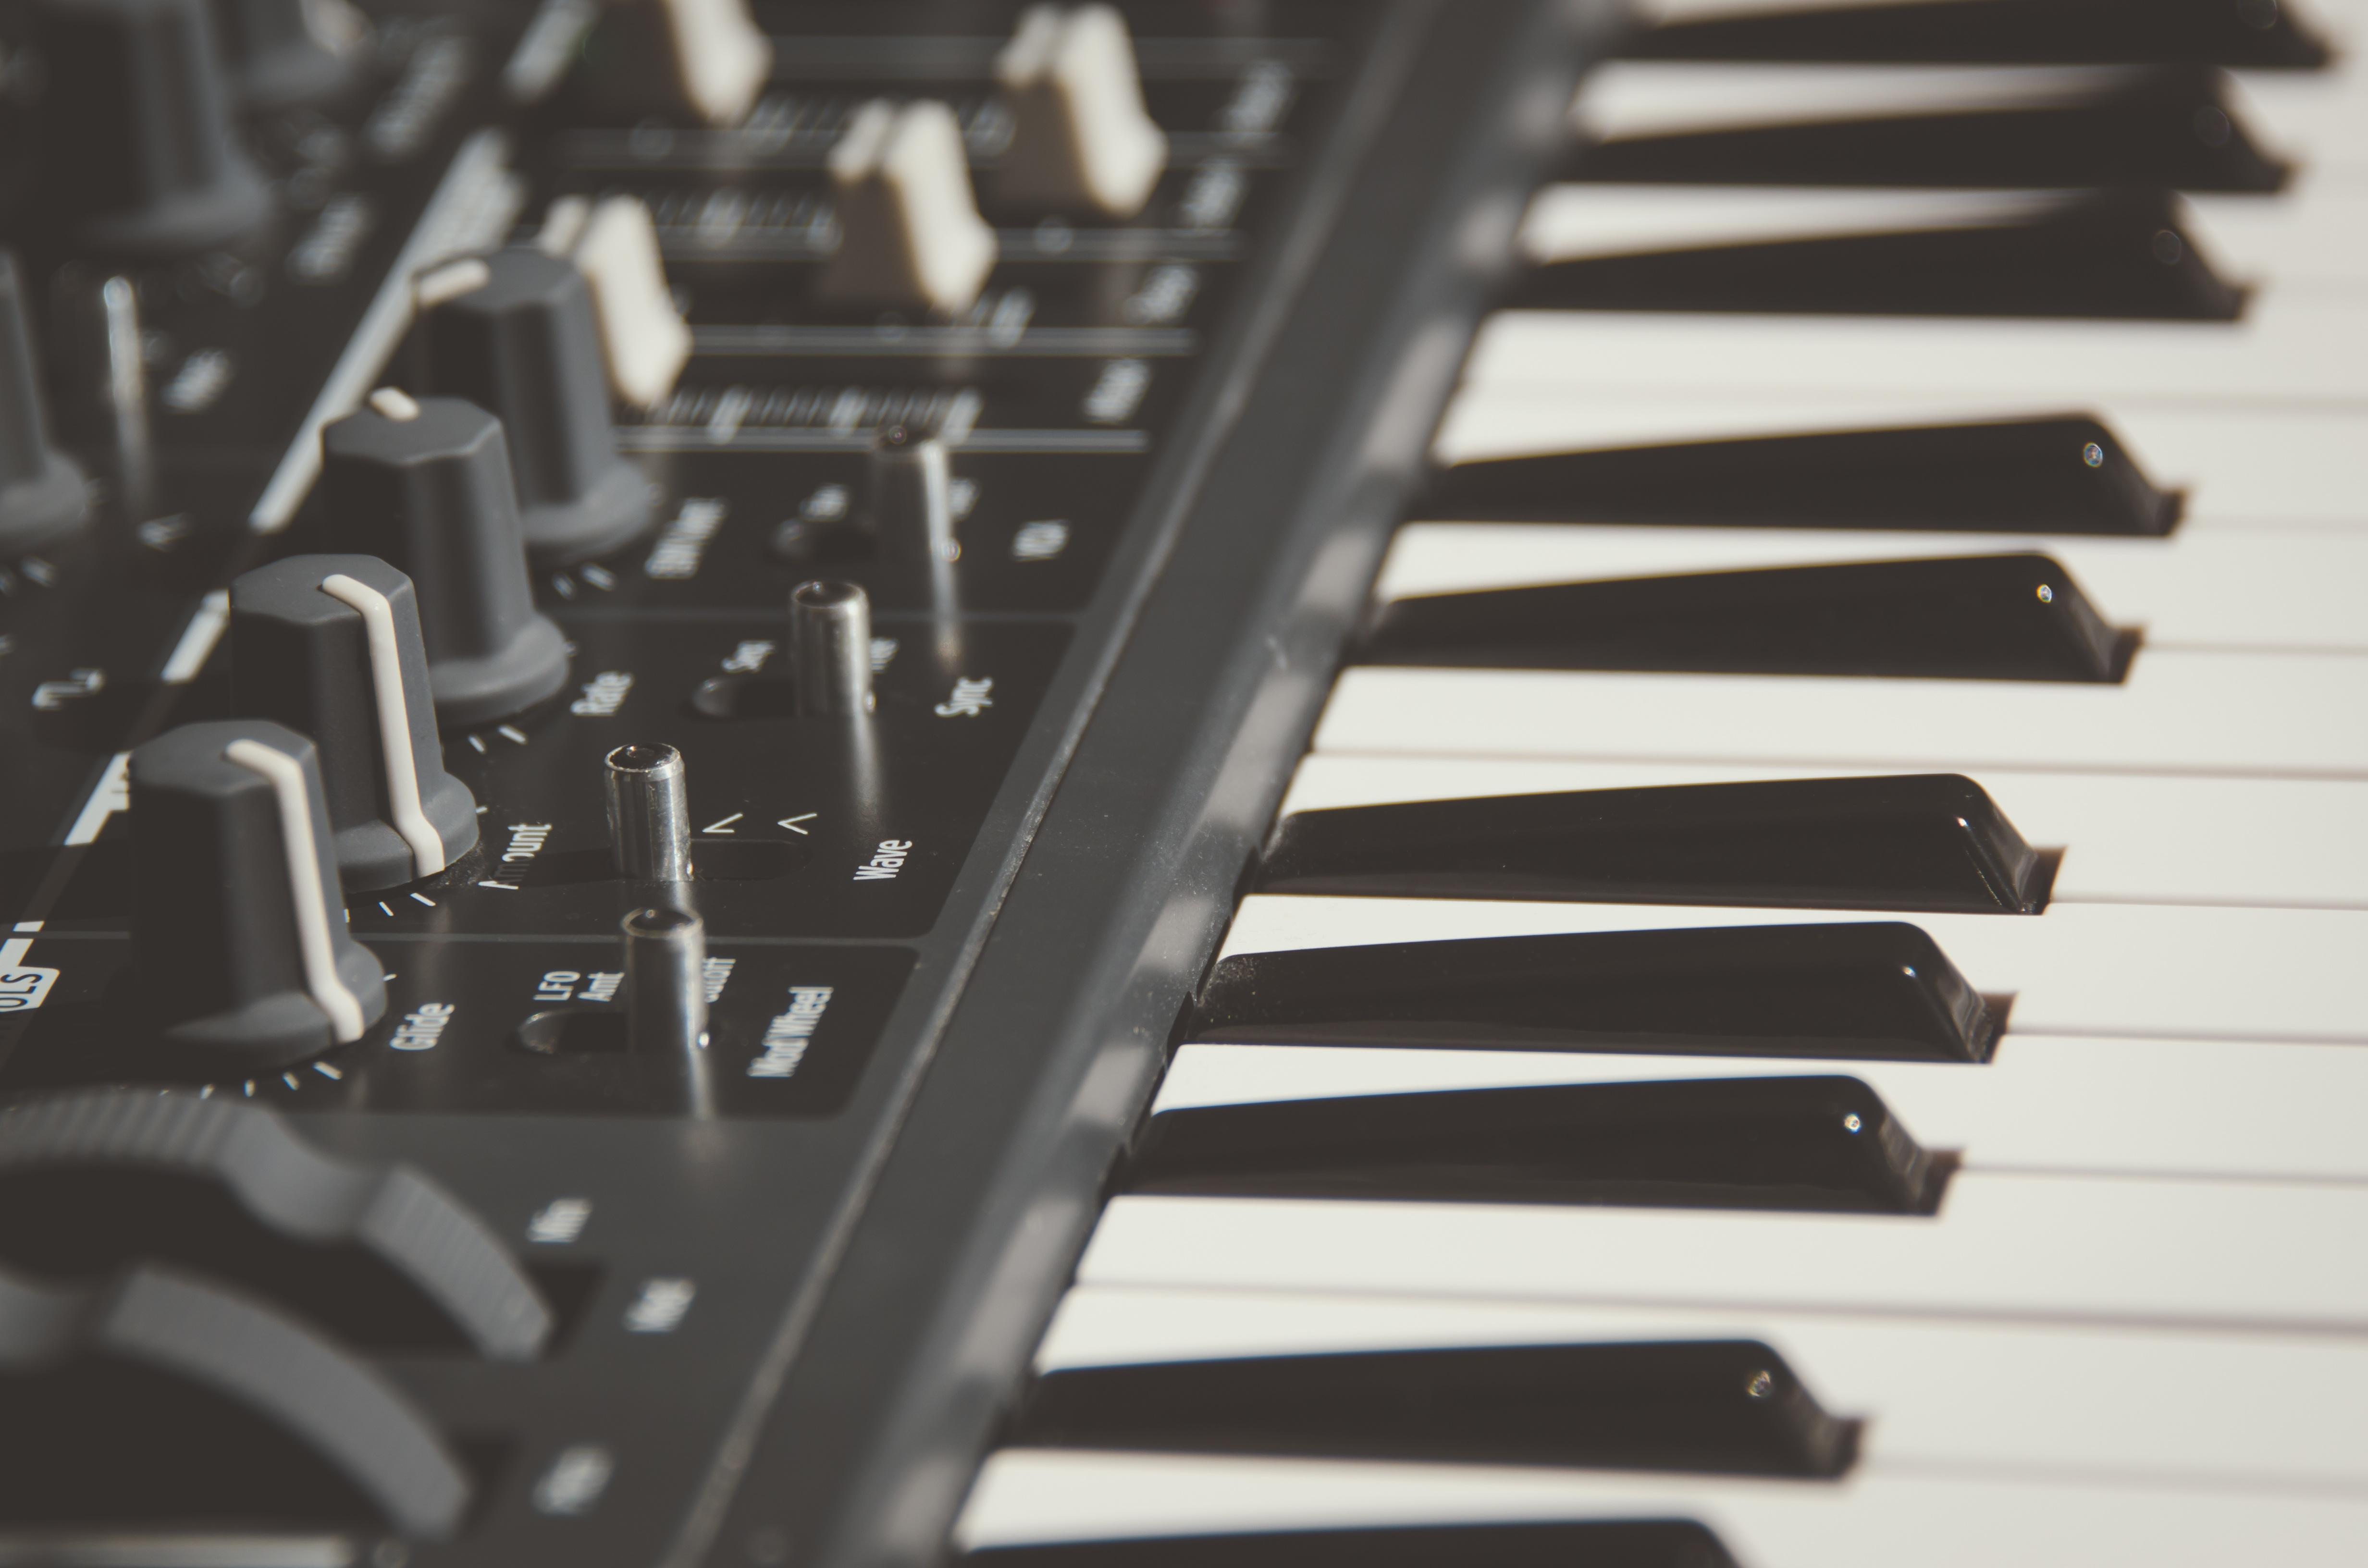 Electronic Keyboard 4k Uhd Wallpaper